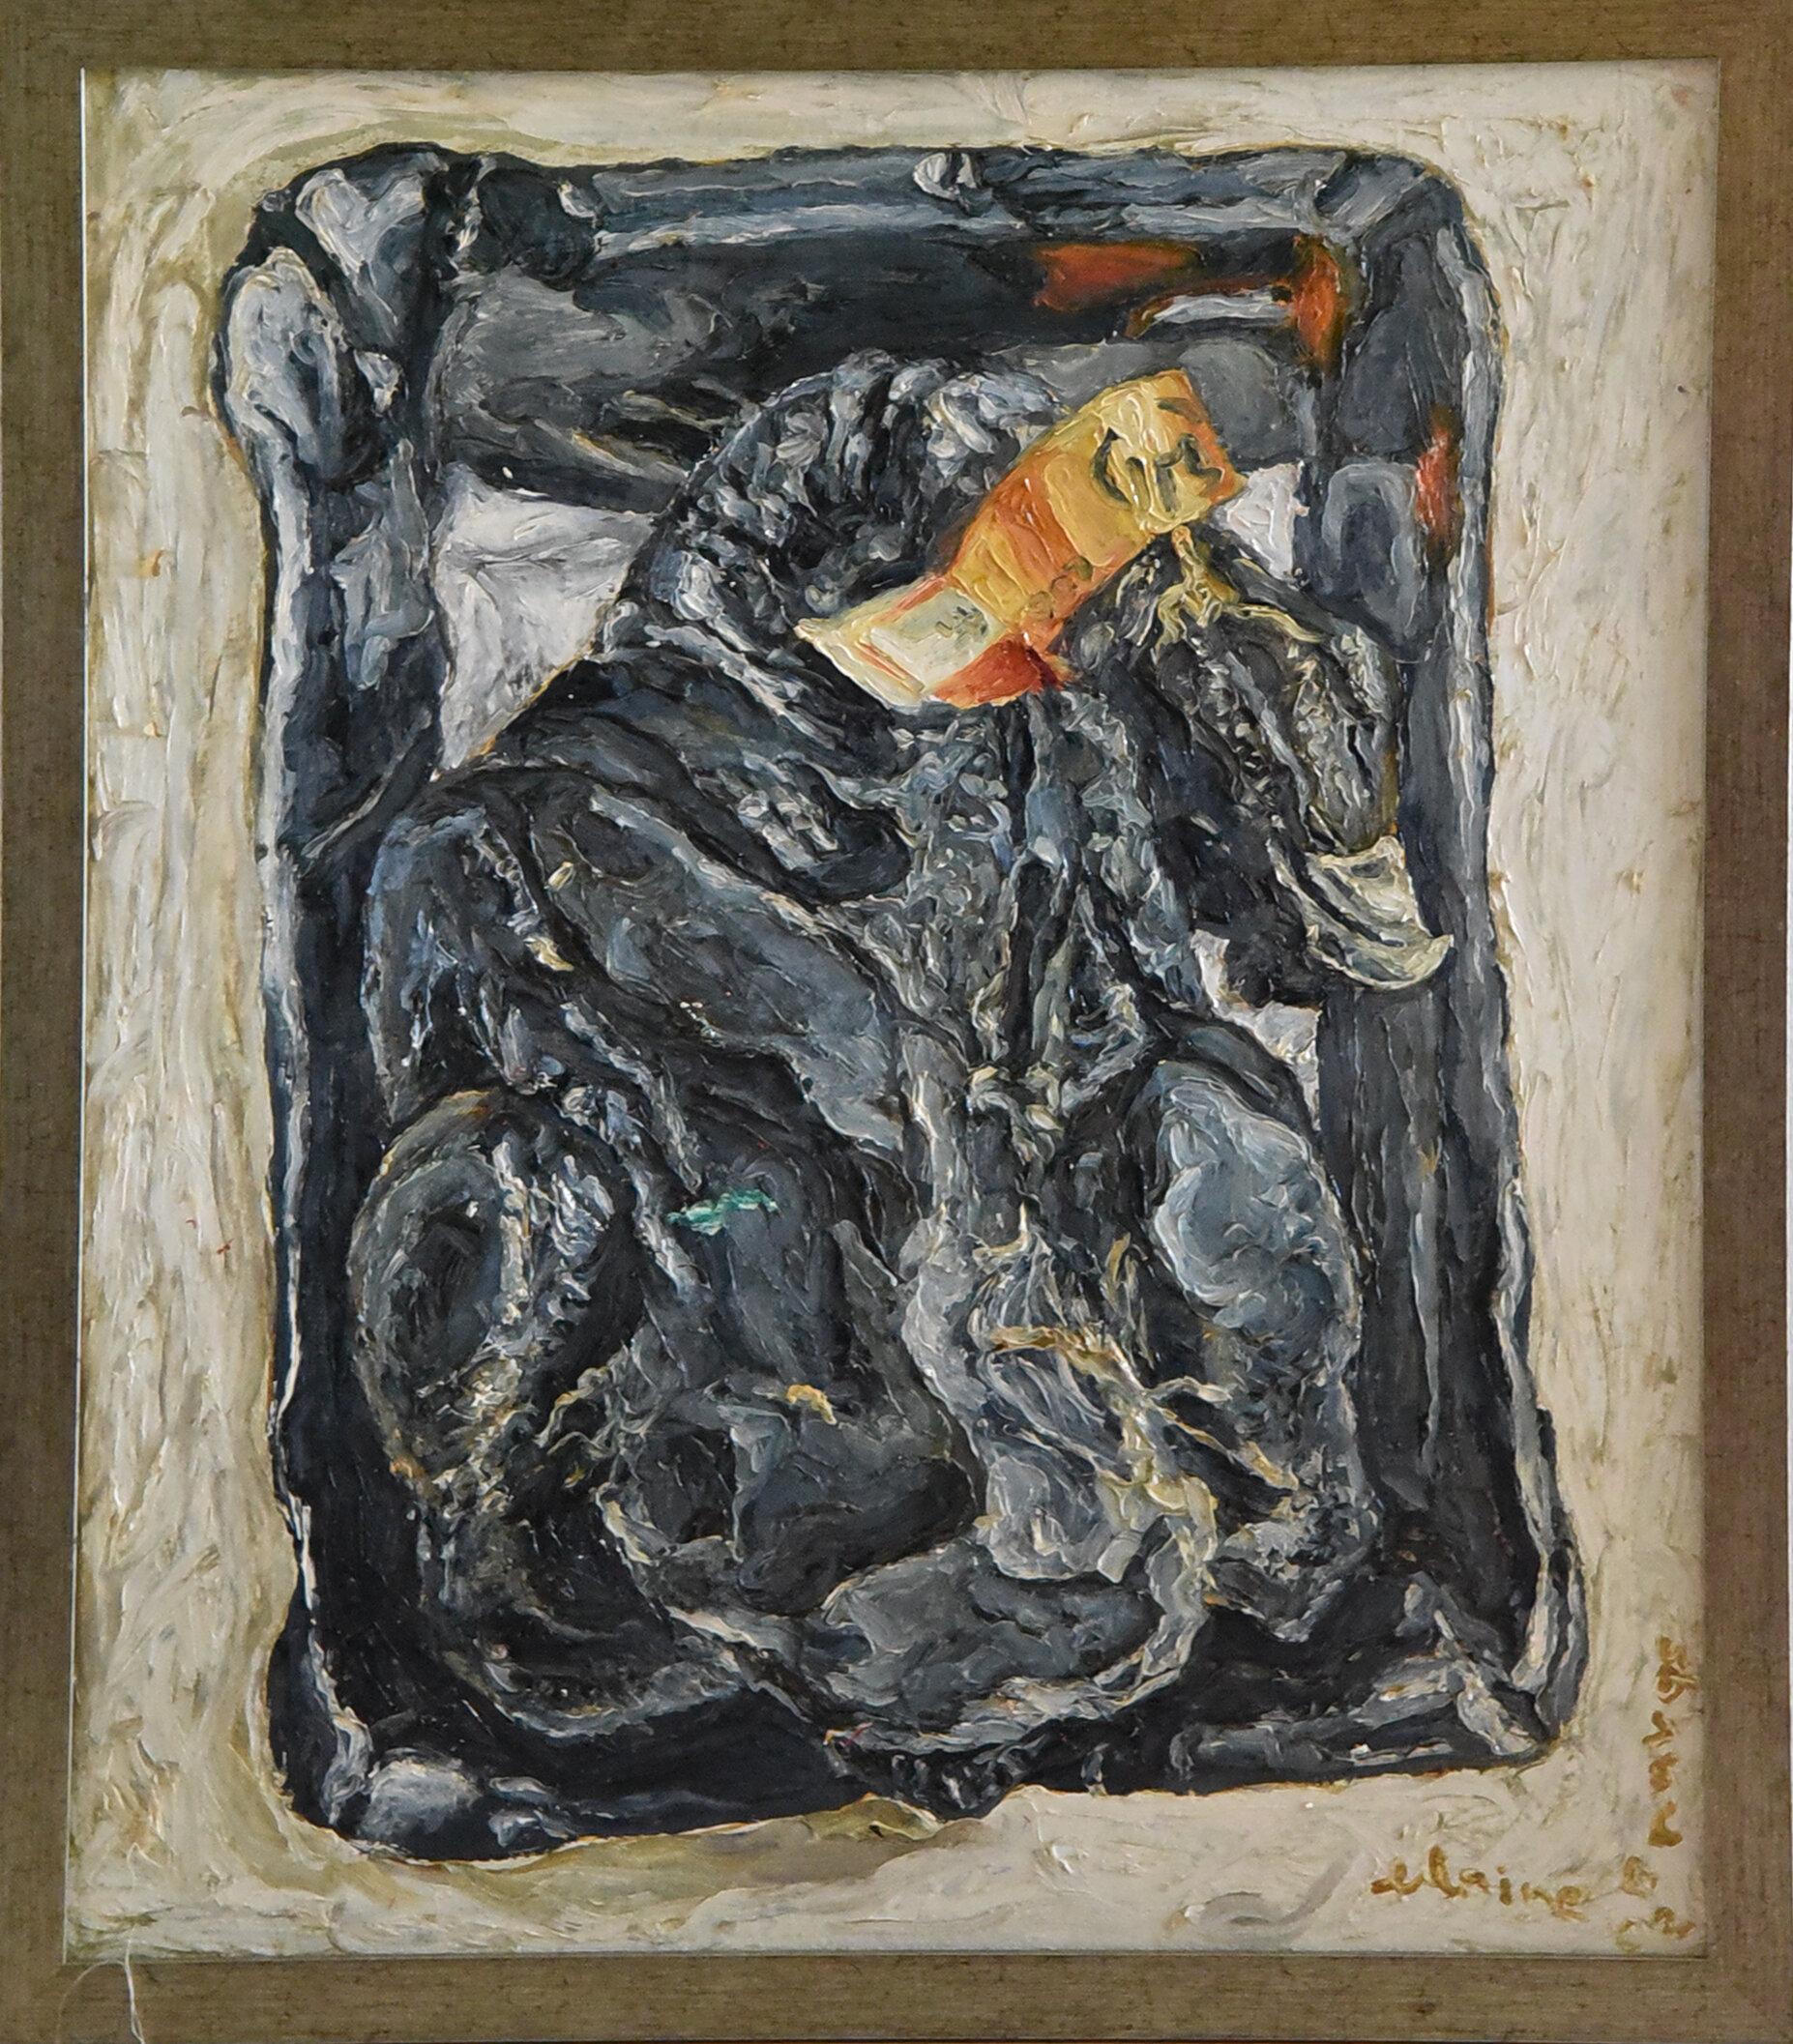 Elaine ROBERTO NAVAS  Grocery Painting II  2003 Oil on canvas H91.4 x W76.2 cm (artwork) H97.8 x W83.2 x D2.5 cm (frame)